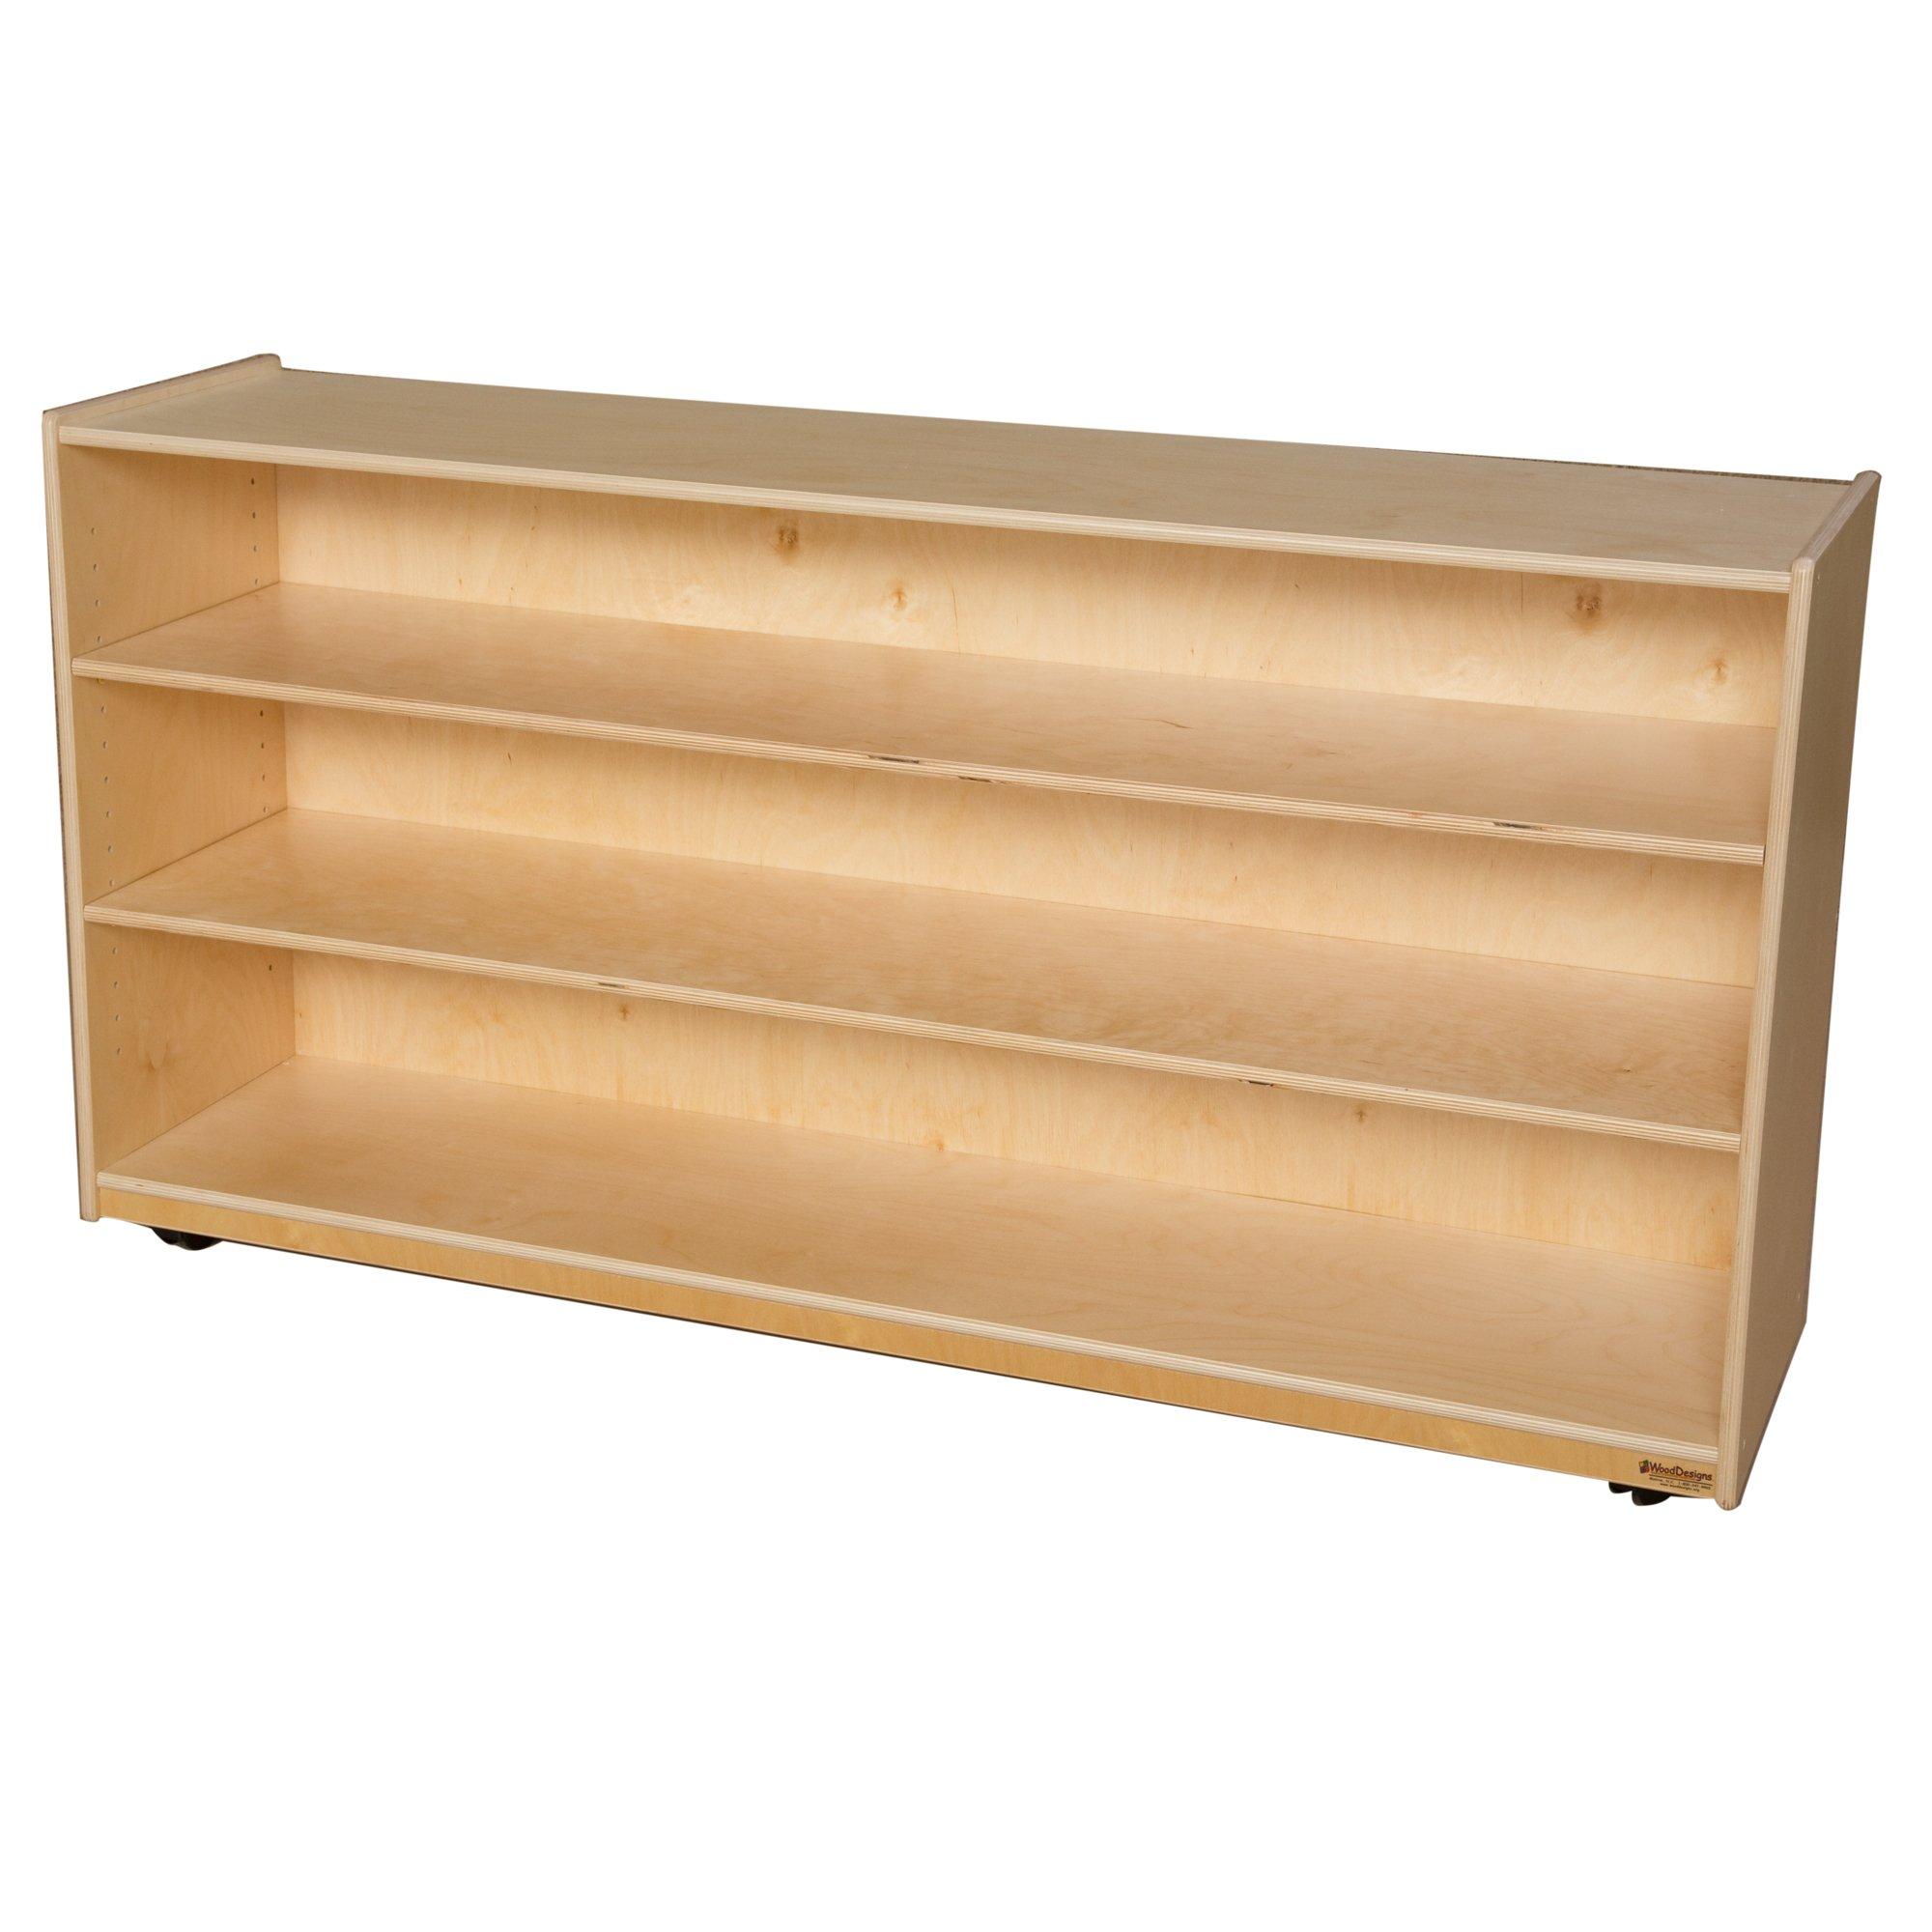 Wood Designs 995832 Mobile Shelf Storage